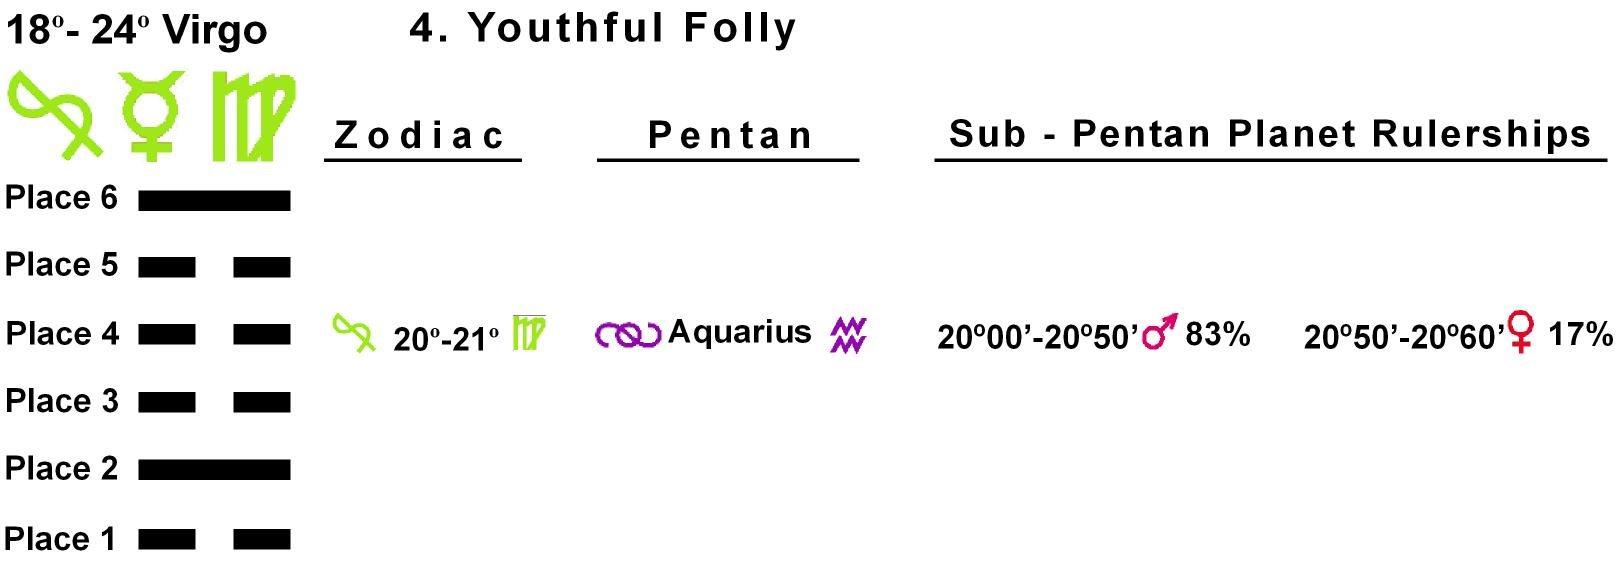 Pent-lines-06VI 20-21 Hx-04 Youthful Folly